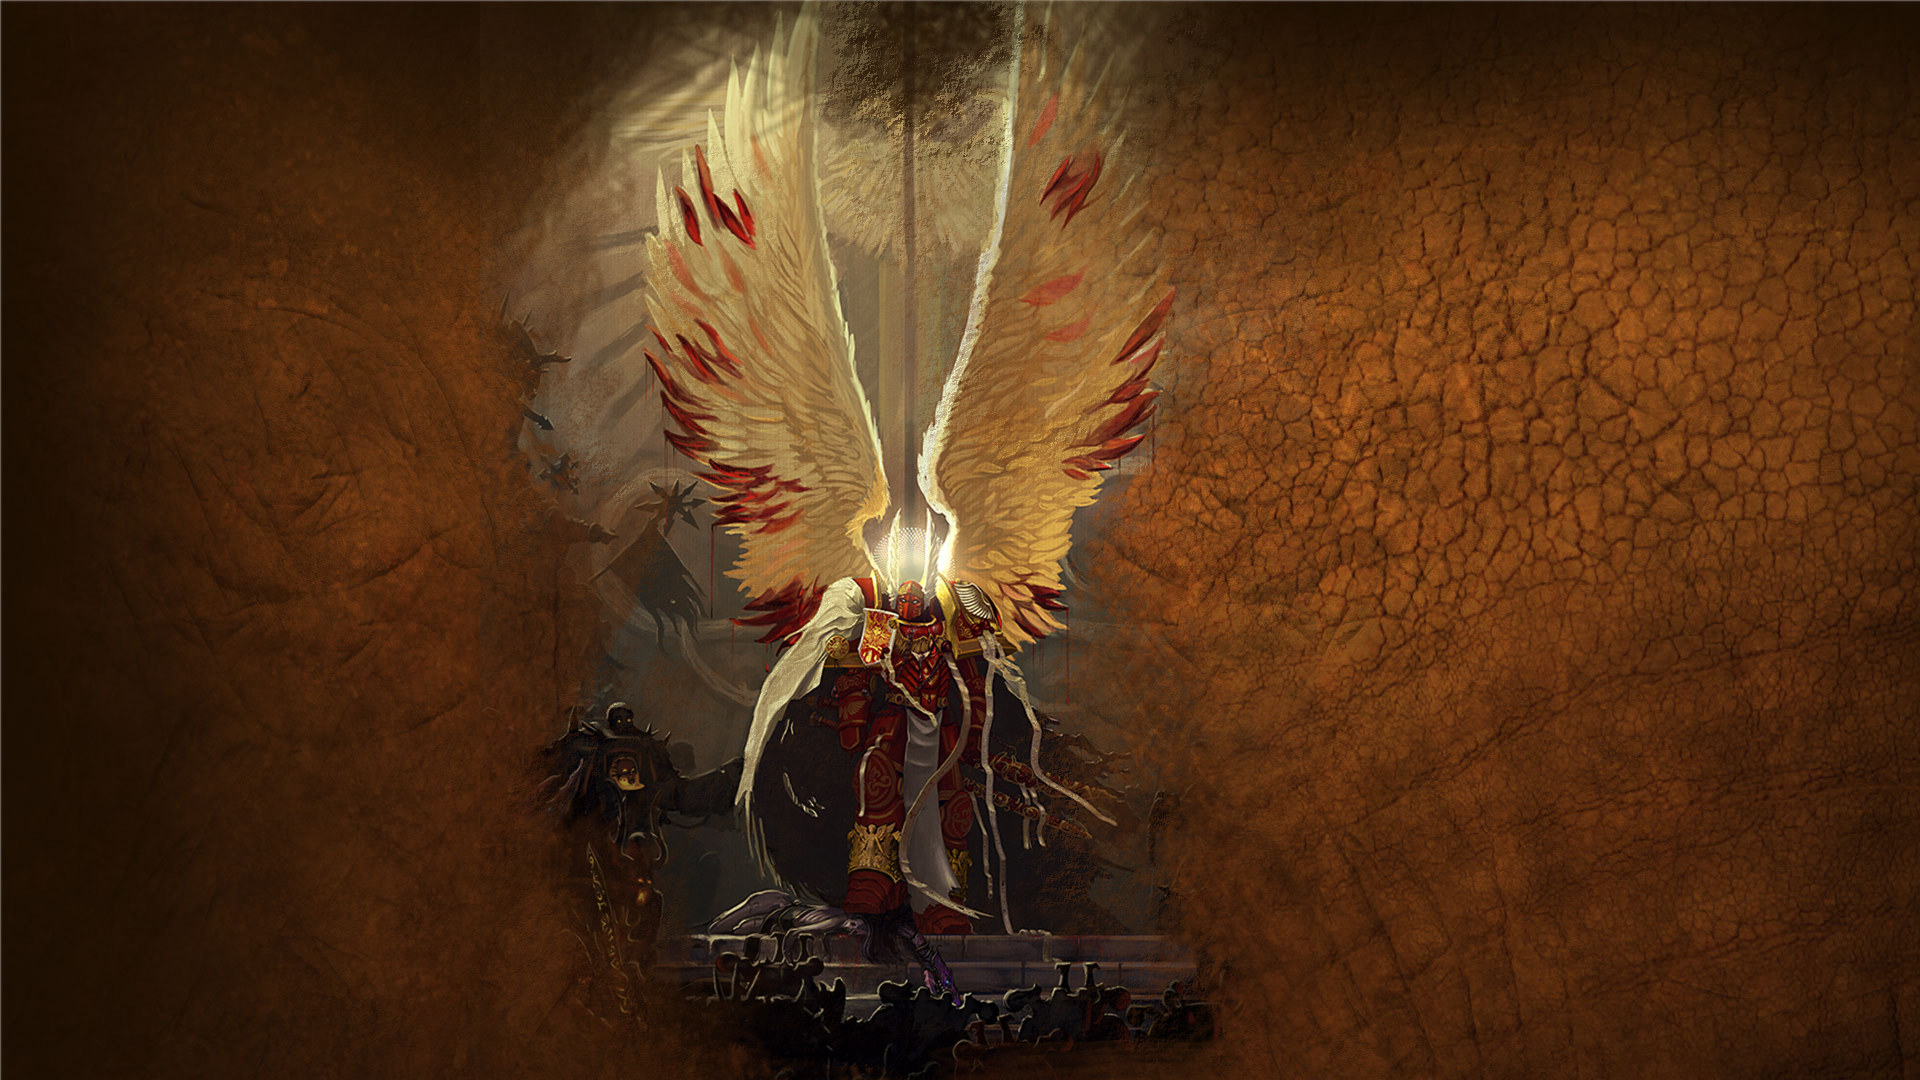 Warhammer 40k death company wallpaper - Warhammer 40k Blood Angels Sanguinius Hd Wallpaper Of Games